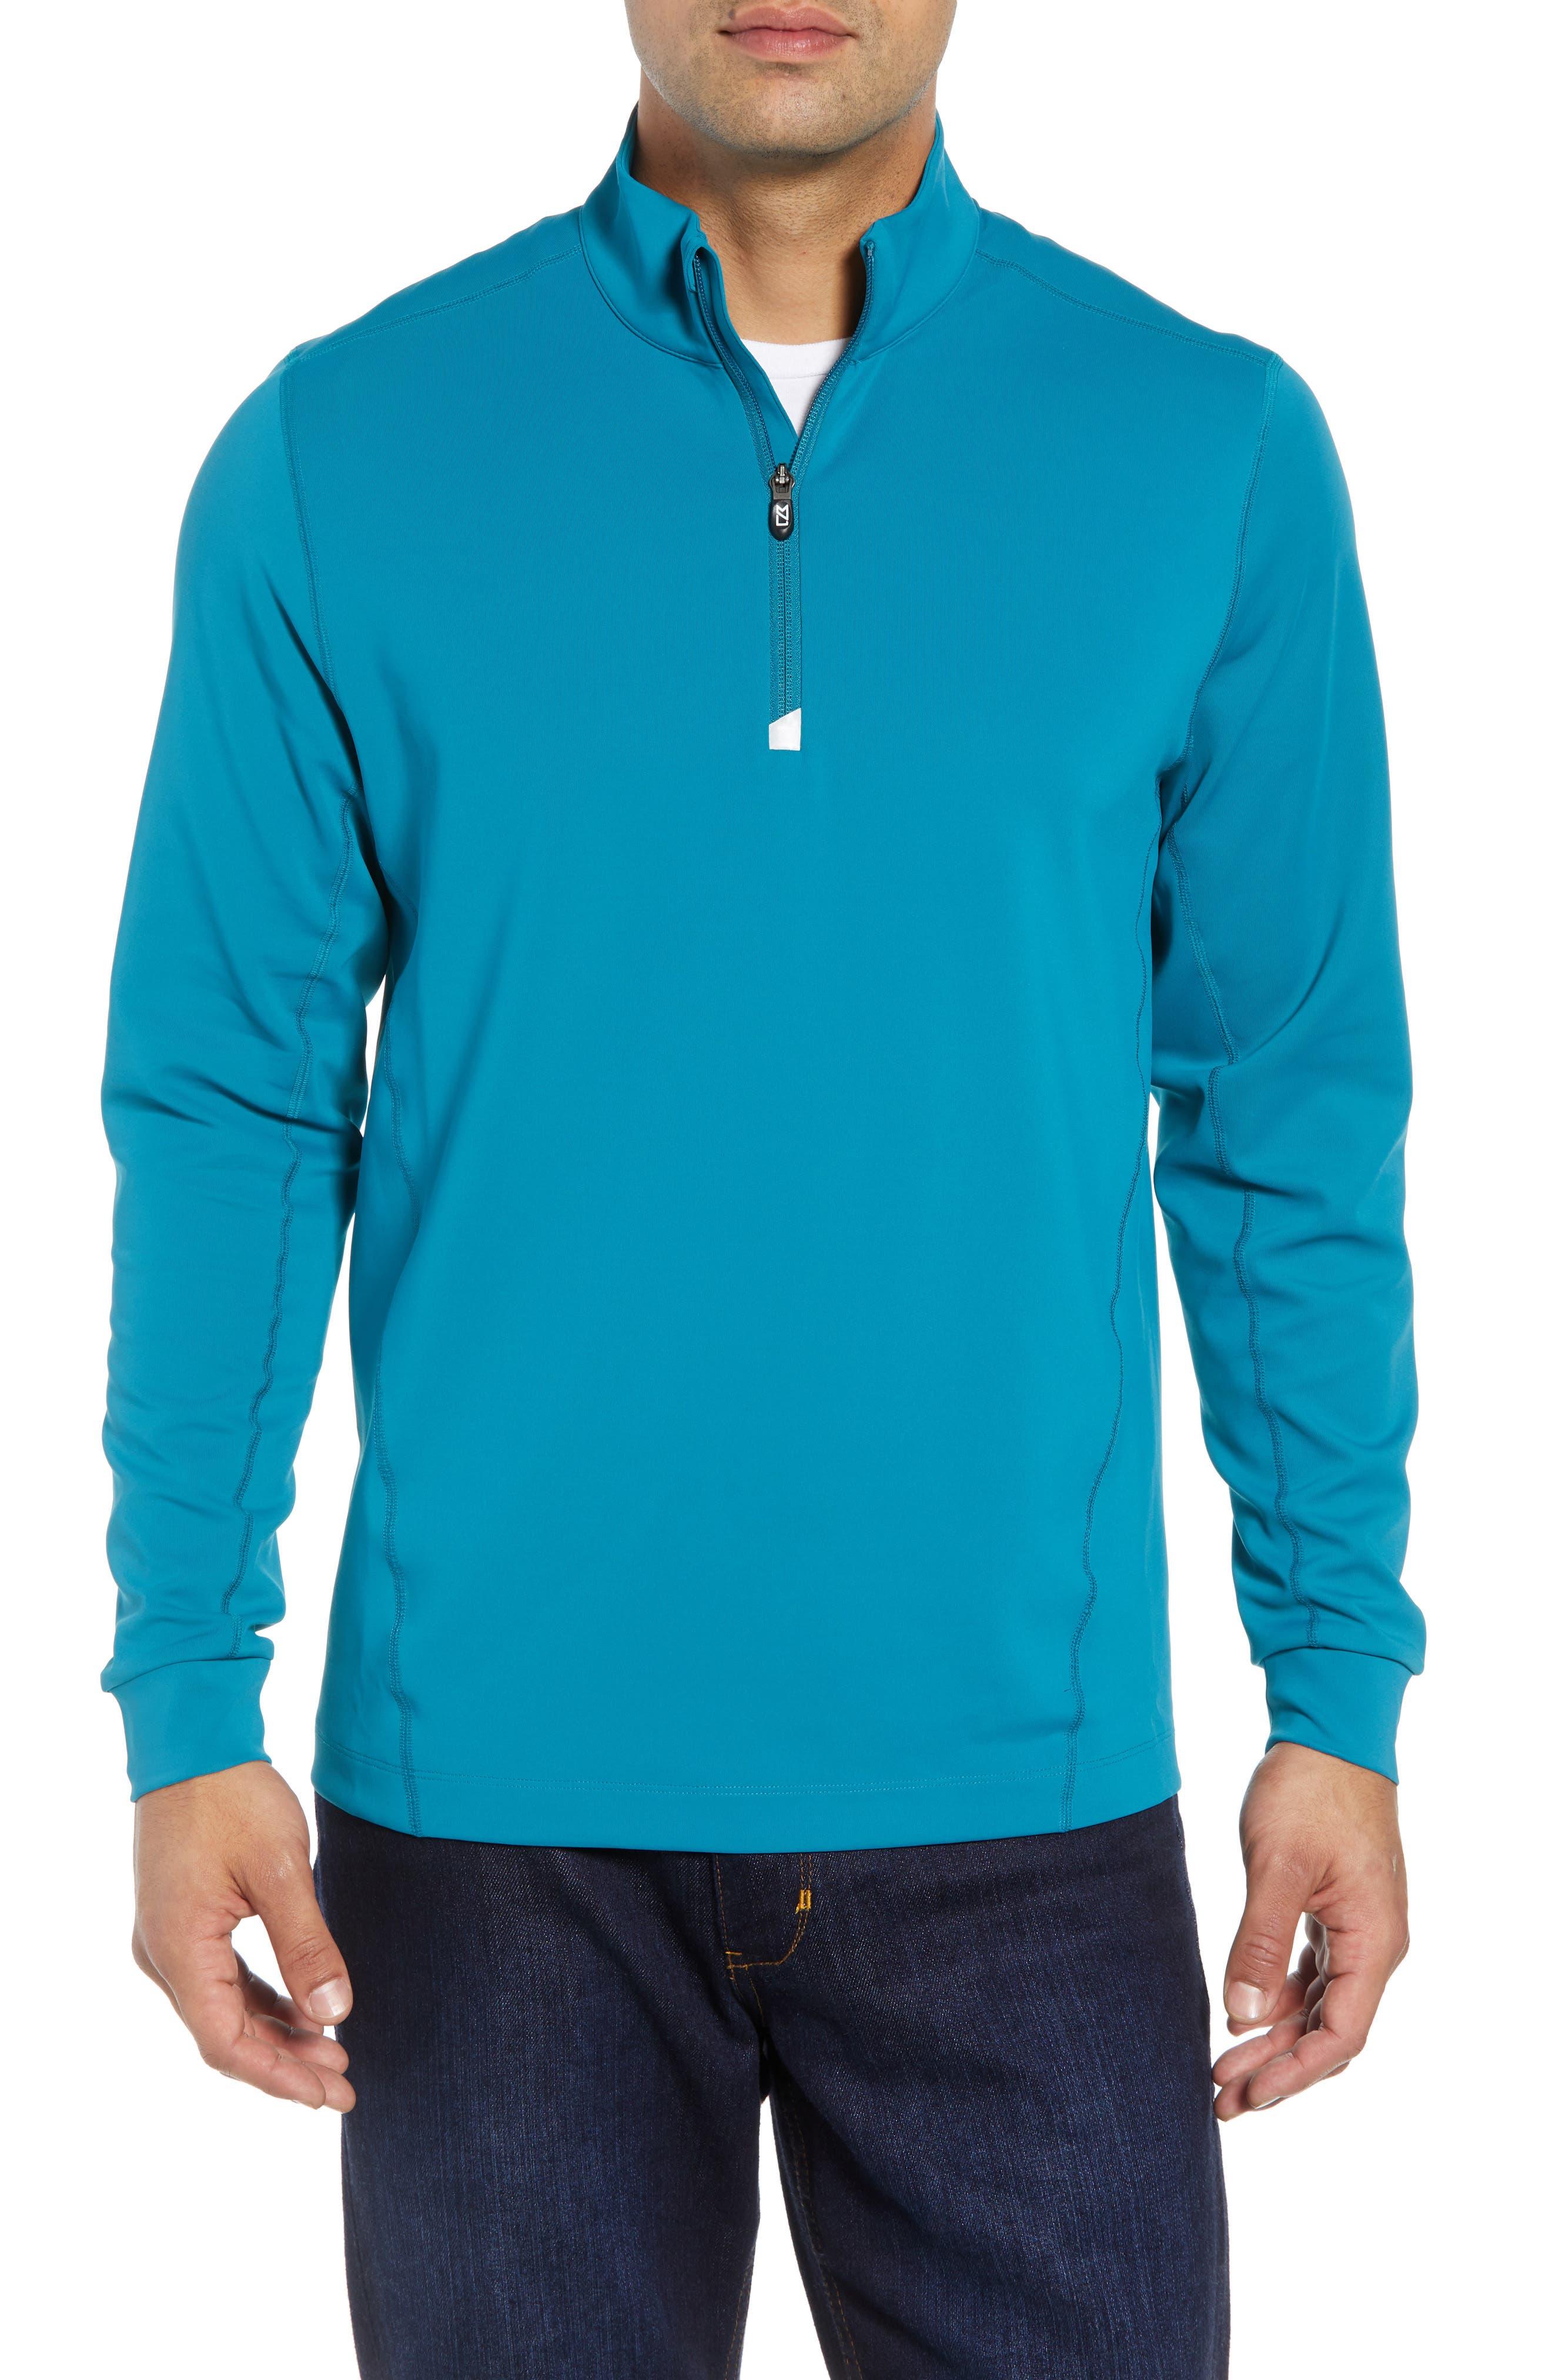 Traverse Regular Fit Quarter Zip Pullover,                         Main,                         color, TEAL BLUE